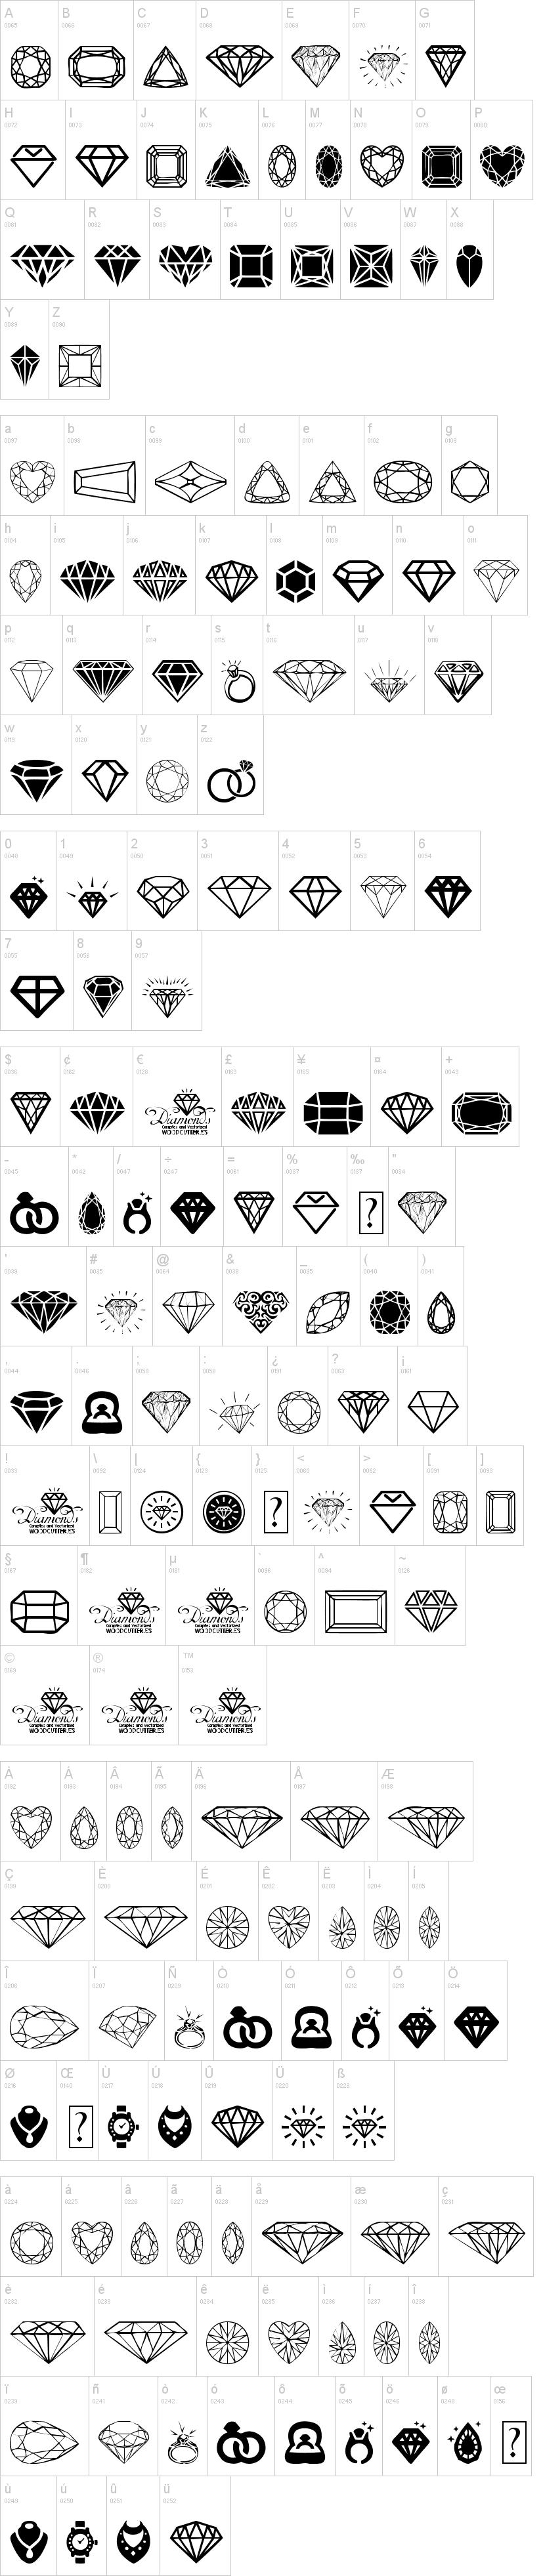 Tattoo ideas for men names diamonds  tatuajes  pinterest  diamond tattoo and tatoo